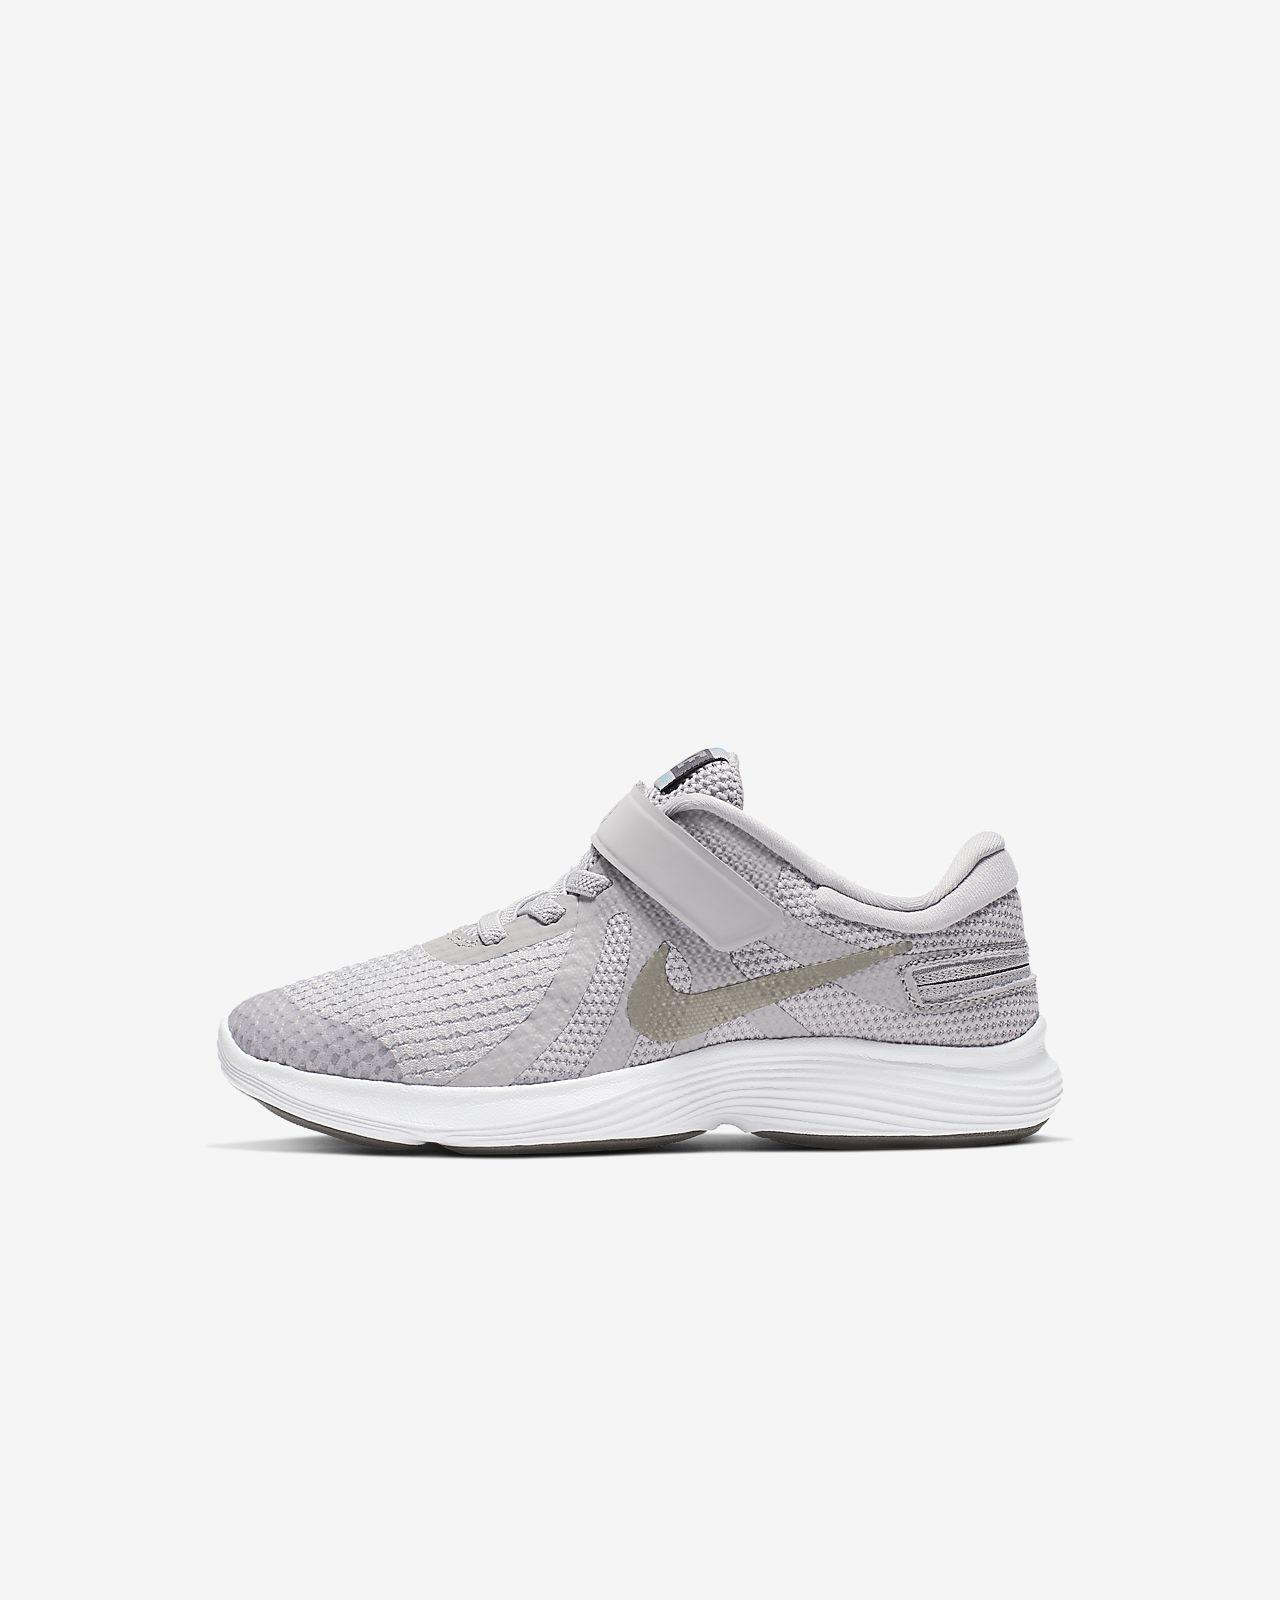 Scarpa Nike Revolution 4 FlyEase - Bambini